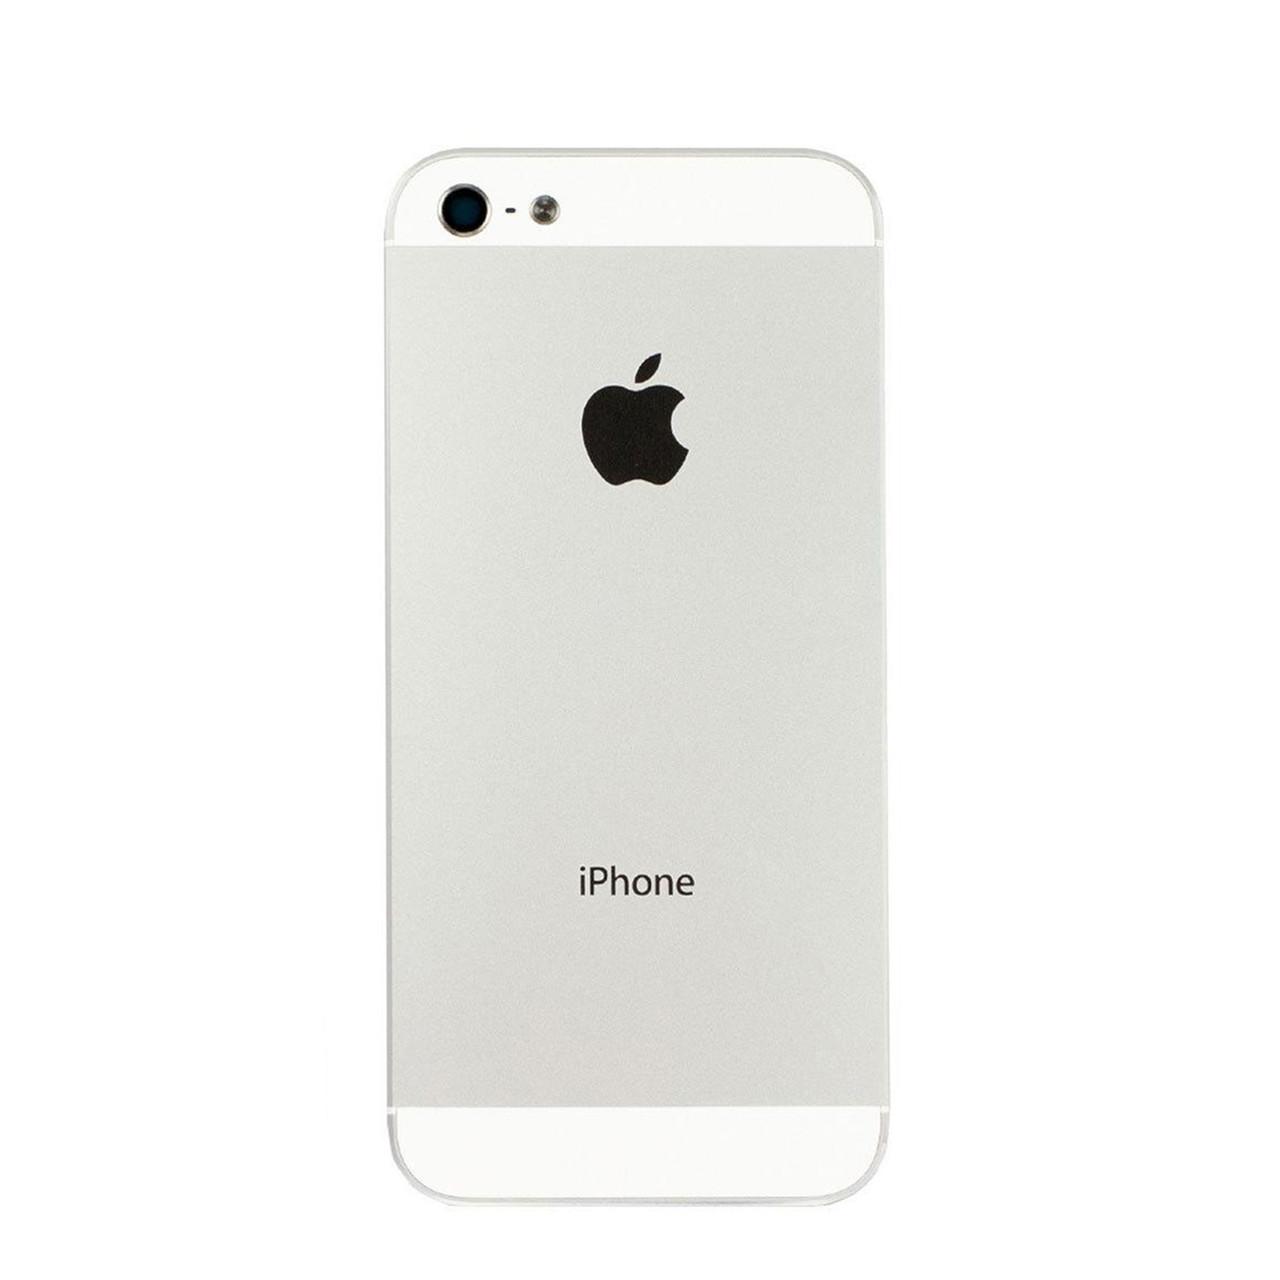 Корпус Apple iPhone 5G Silver (66)